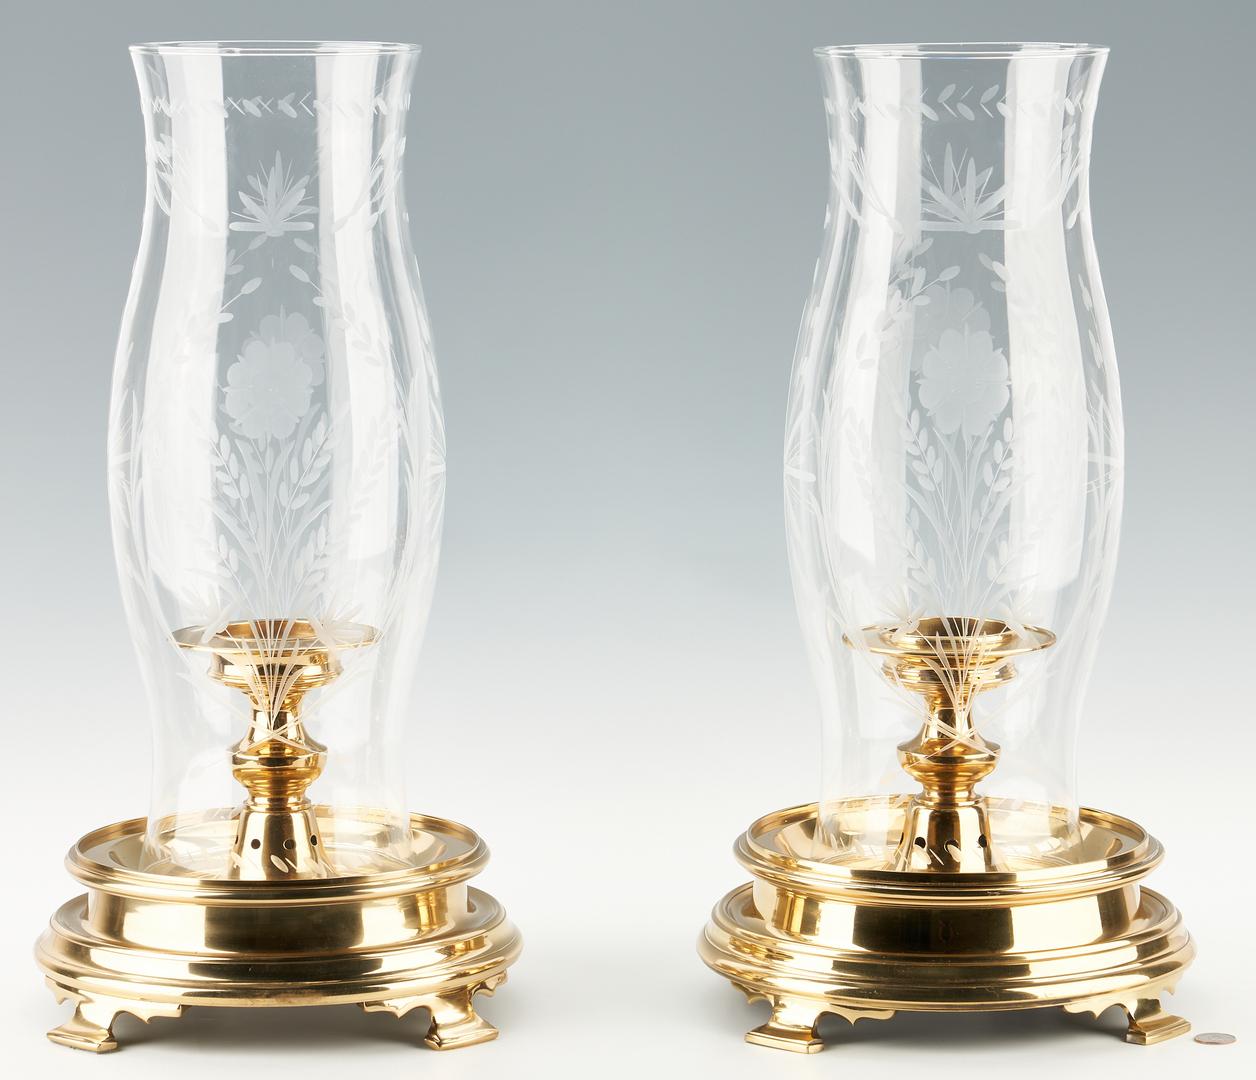 Lot 1165: Pr. Brass Candlesticks w/ Hurricane Shades & Wrought Iron Floor Candle Lamp, 3 items